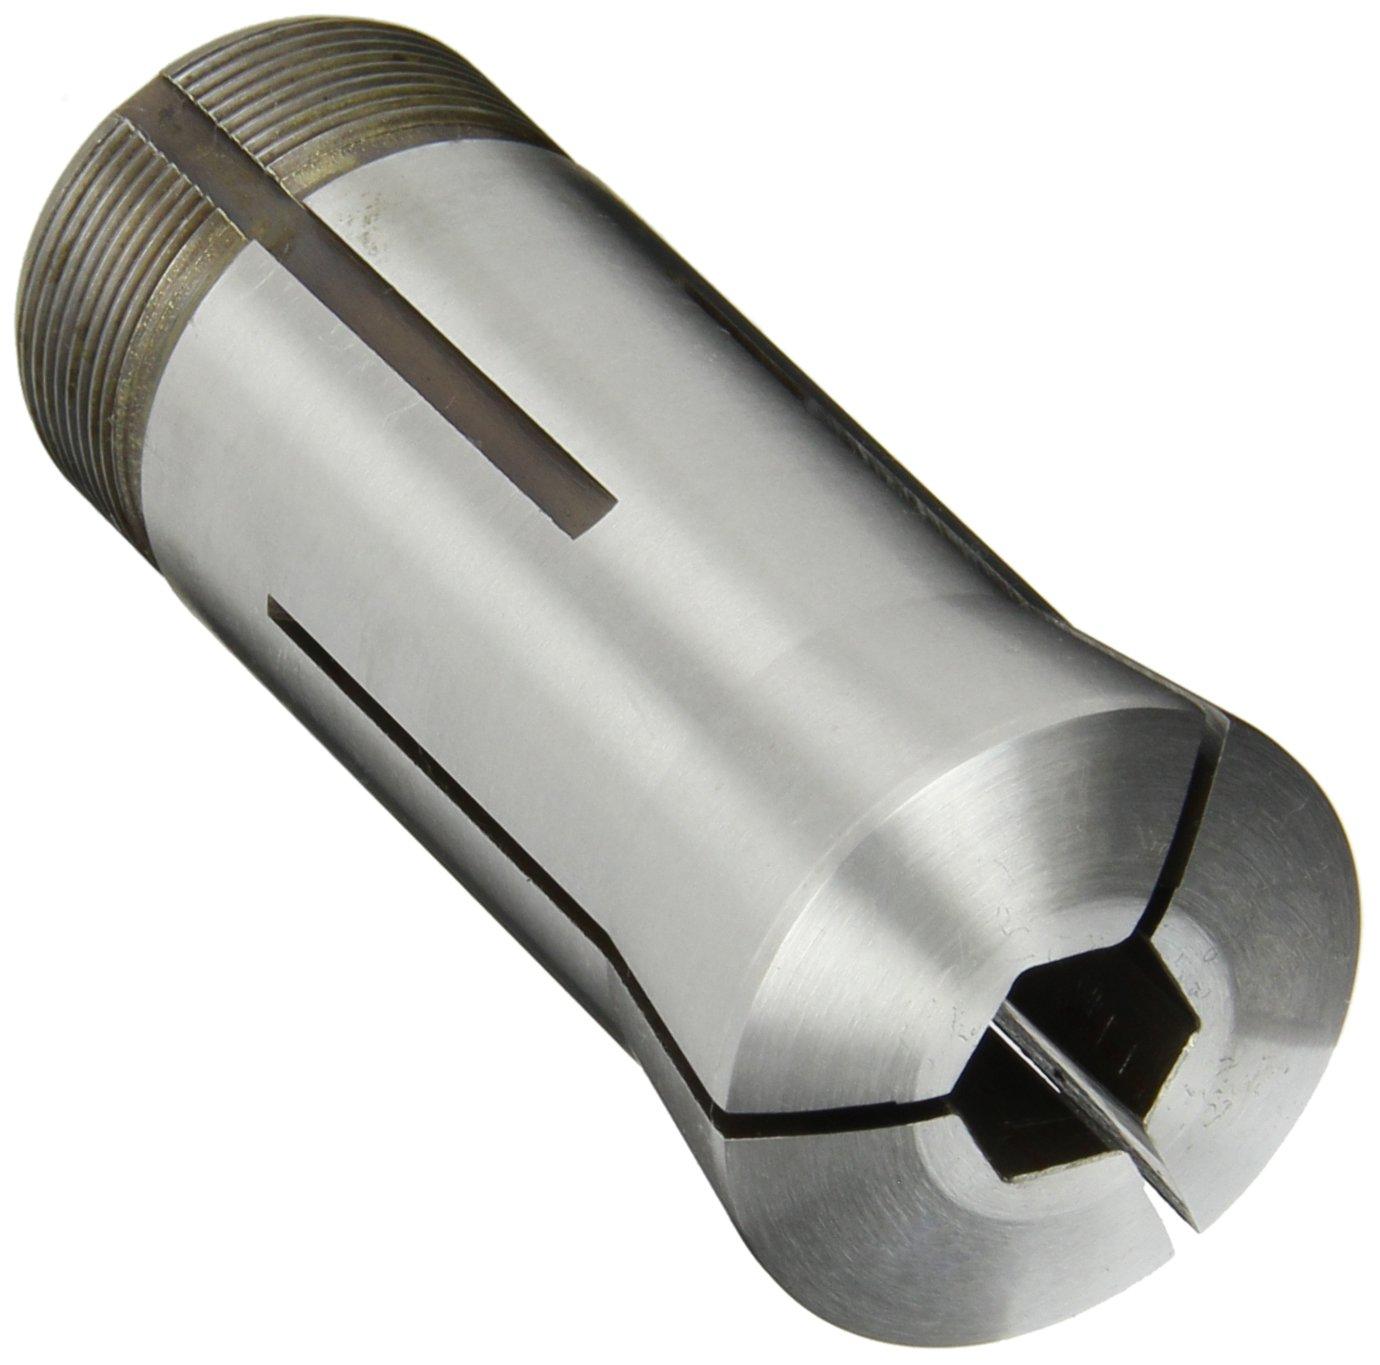 Lyndex 530-032 5C Hex Collet, 1/2'' Opening Size, 3.27'' Length, 1.485'' Top Diameter, 1.25'' Bottom Diameter